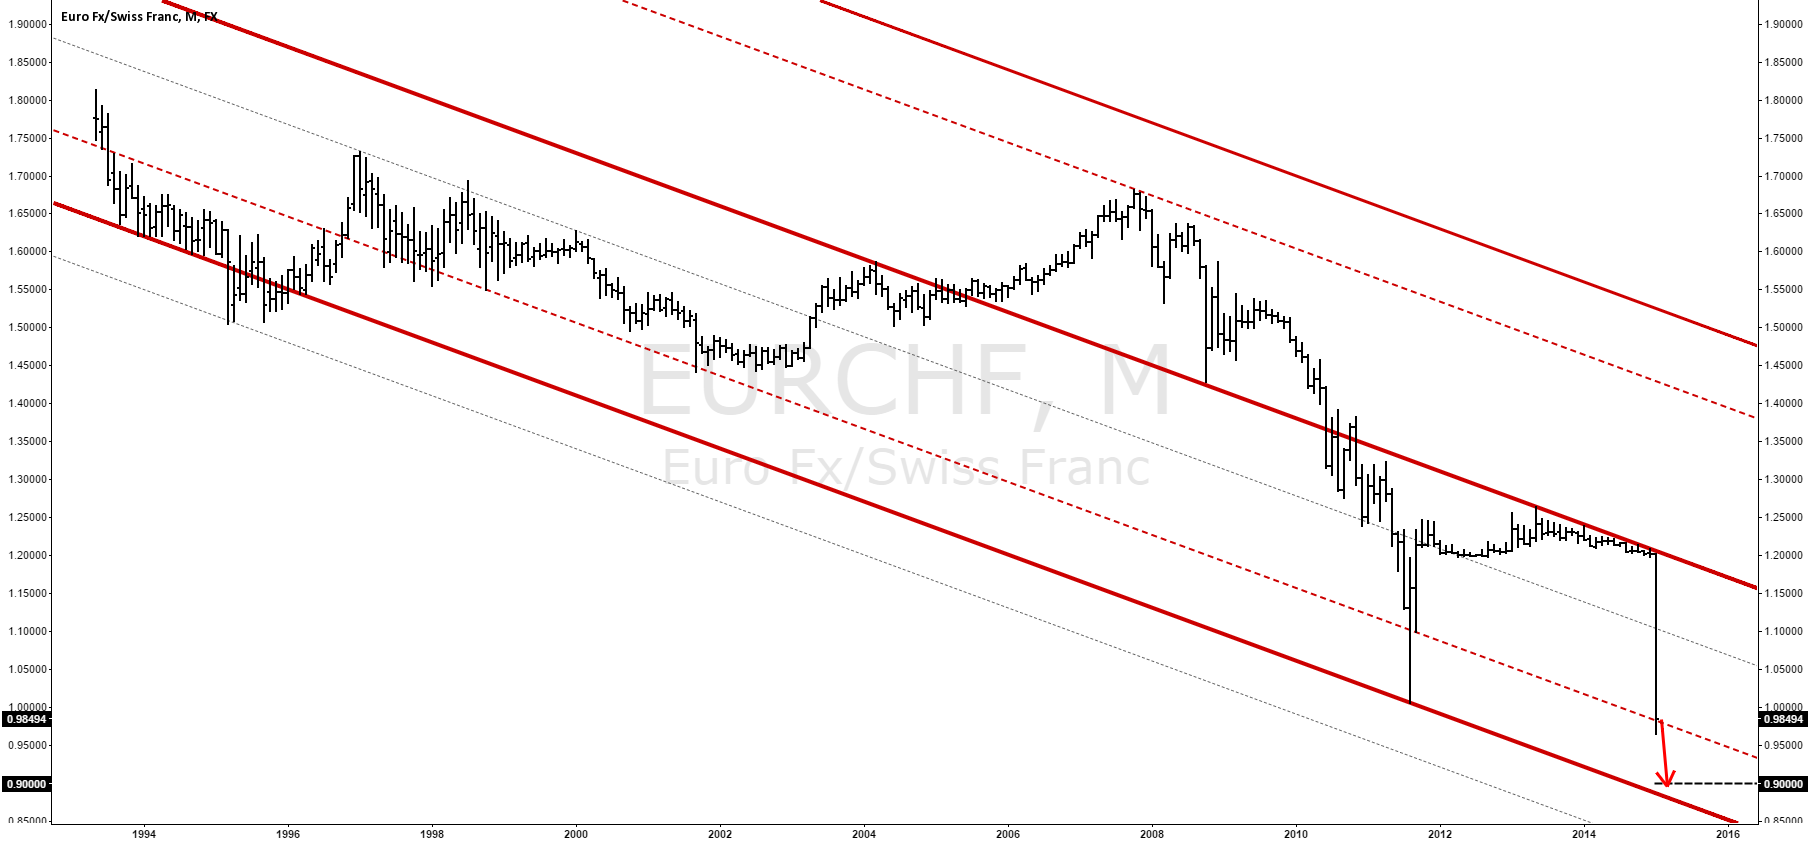 EURCHF Heading Down